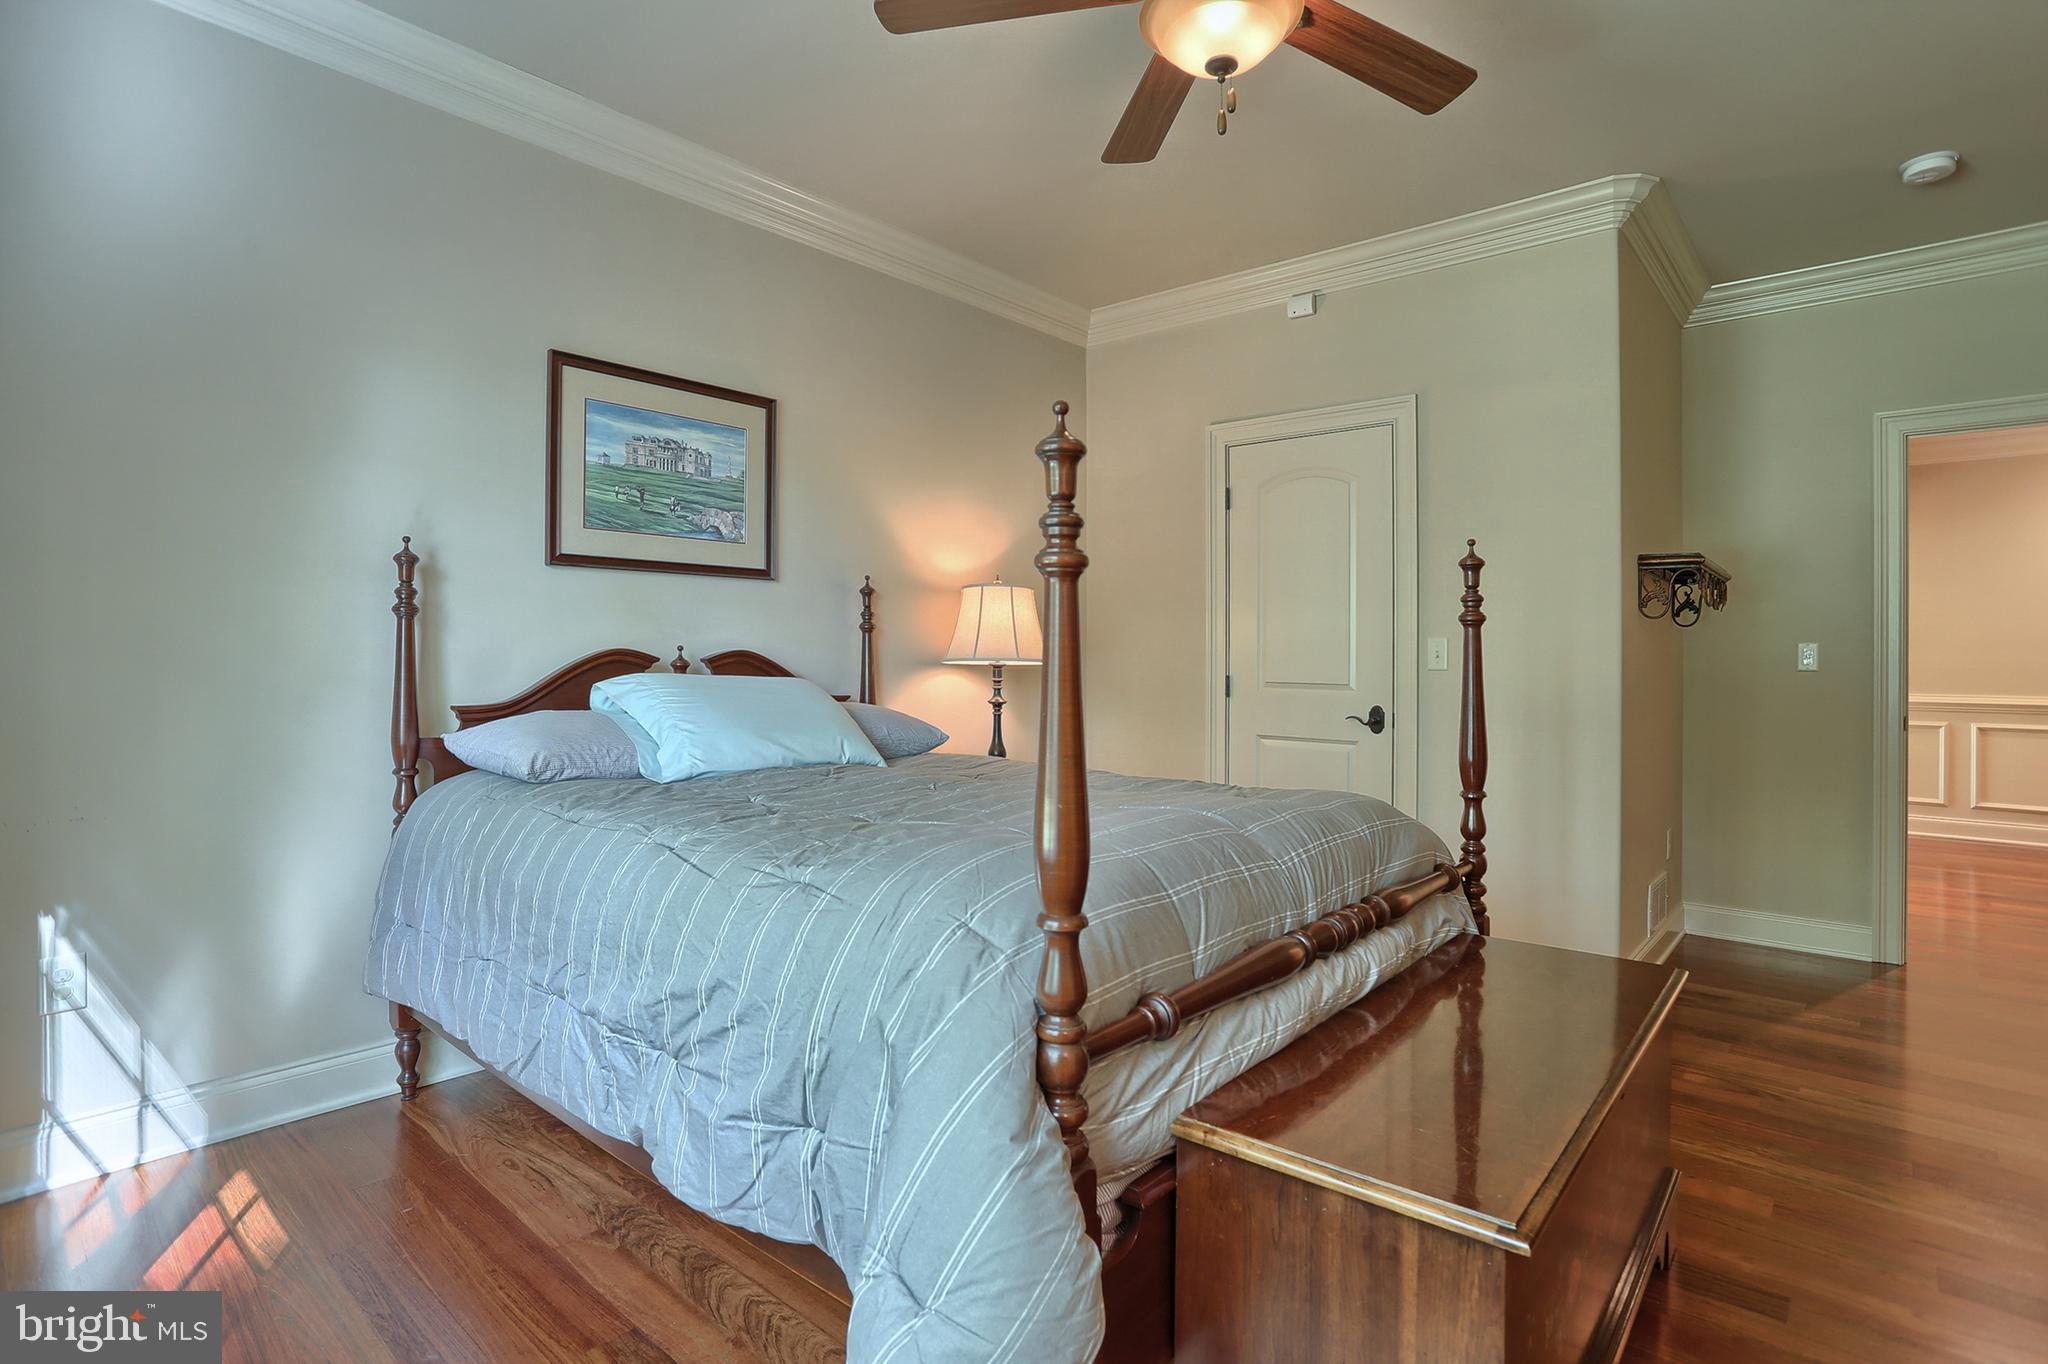 3rd bedroom (13x18) on main